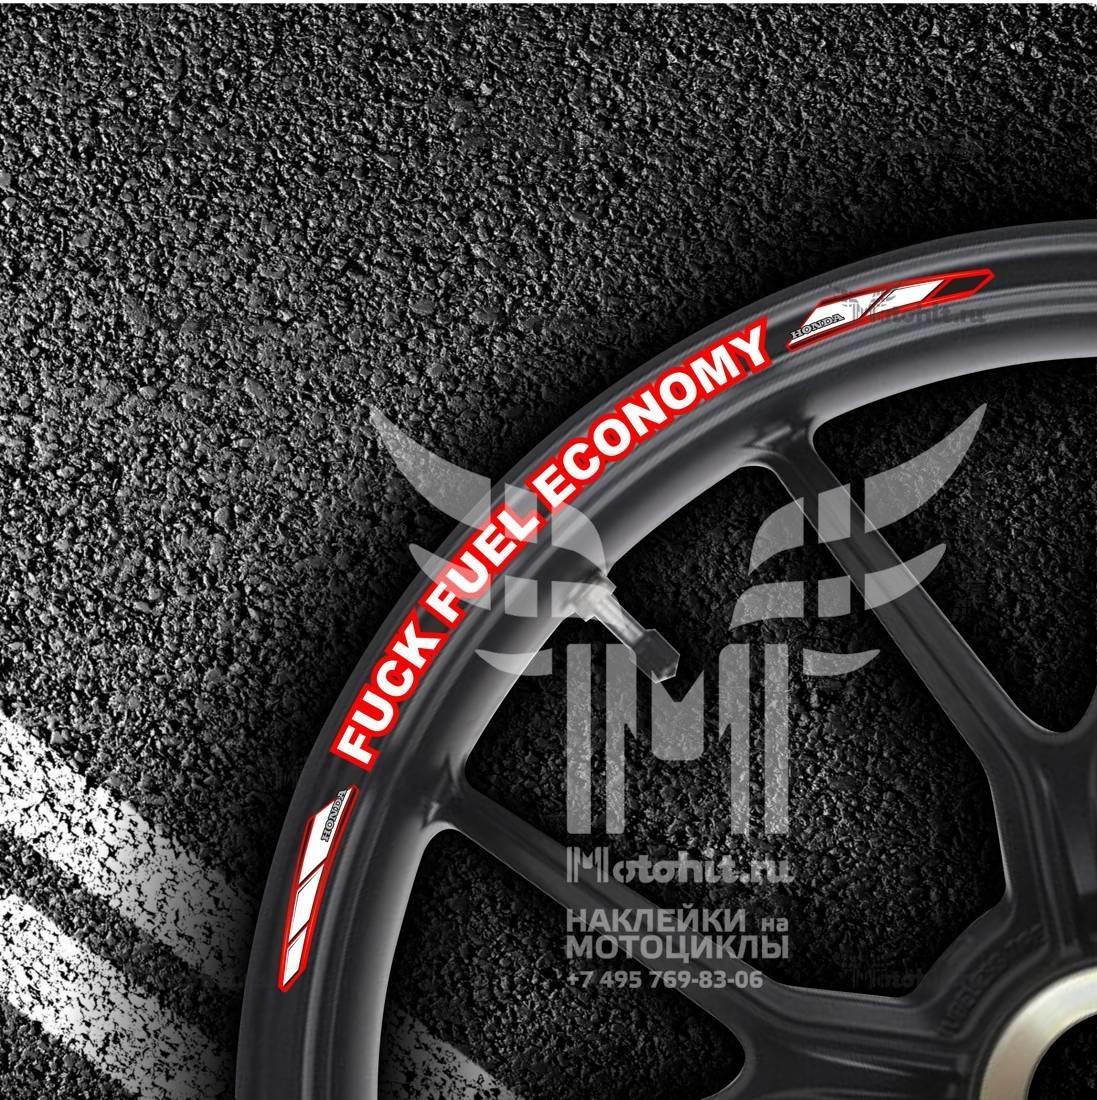 Комплект наклеек на обод колеса мотоцикла HONDA FFU